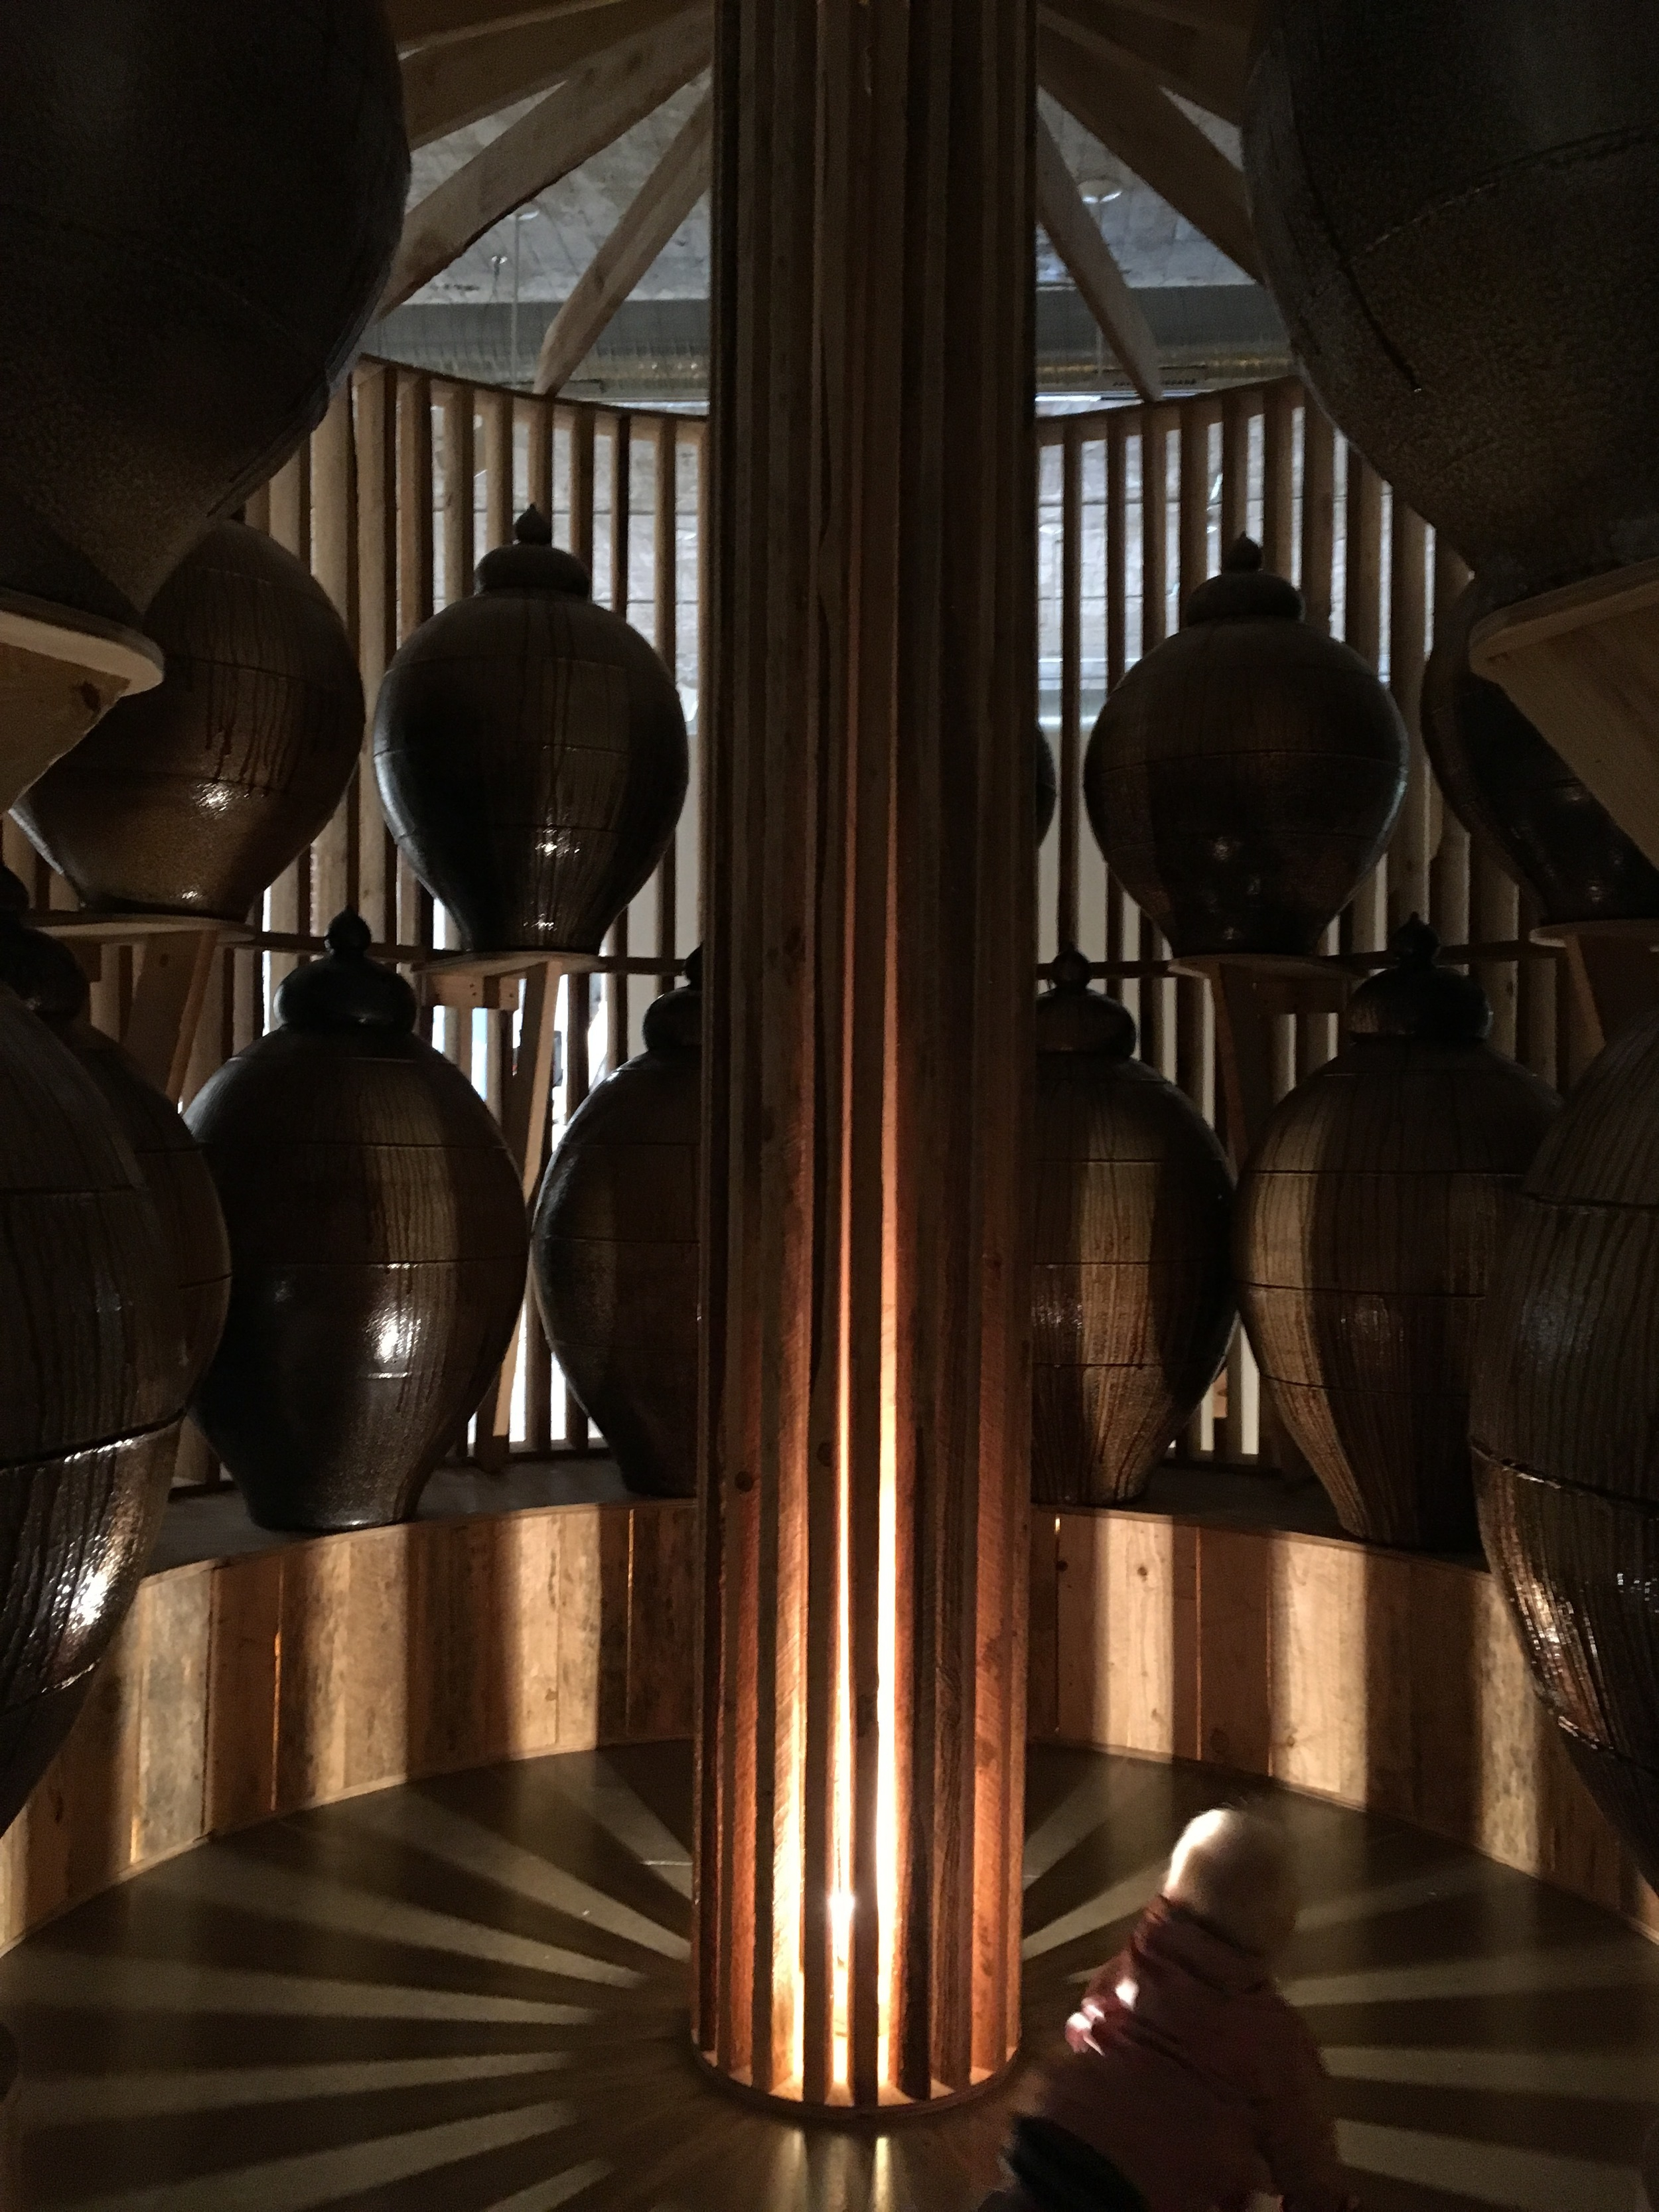 Amazing installation by Daniel Johnston